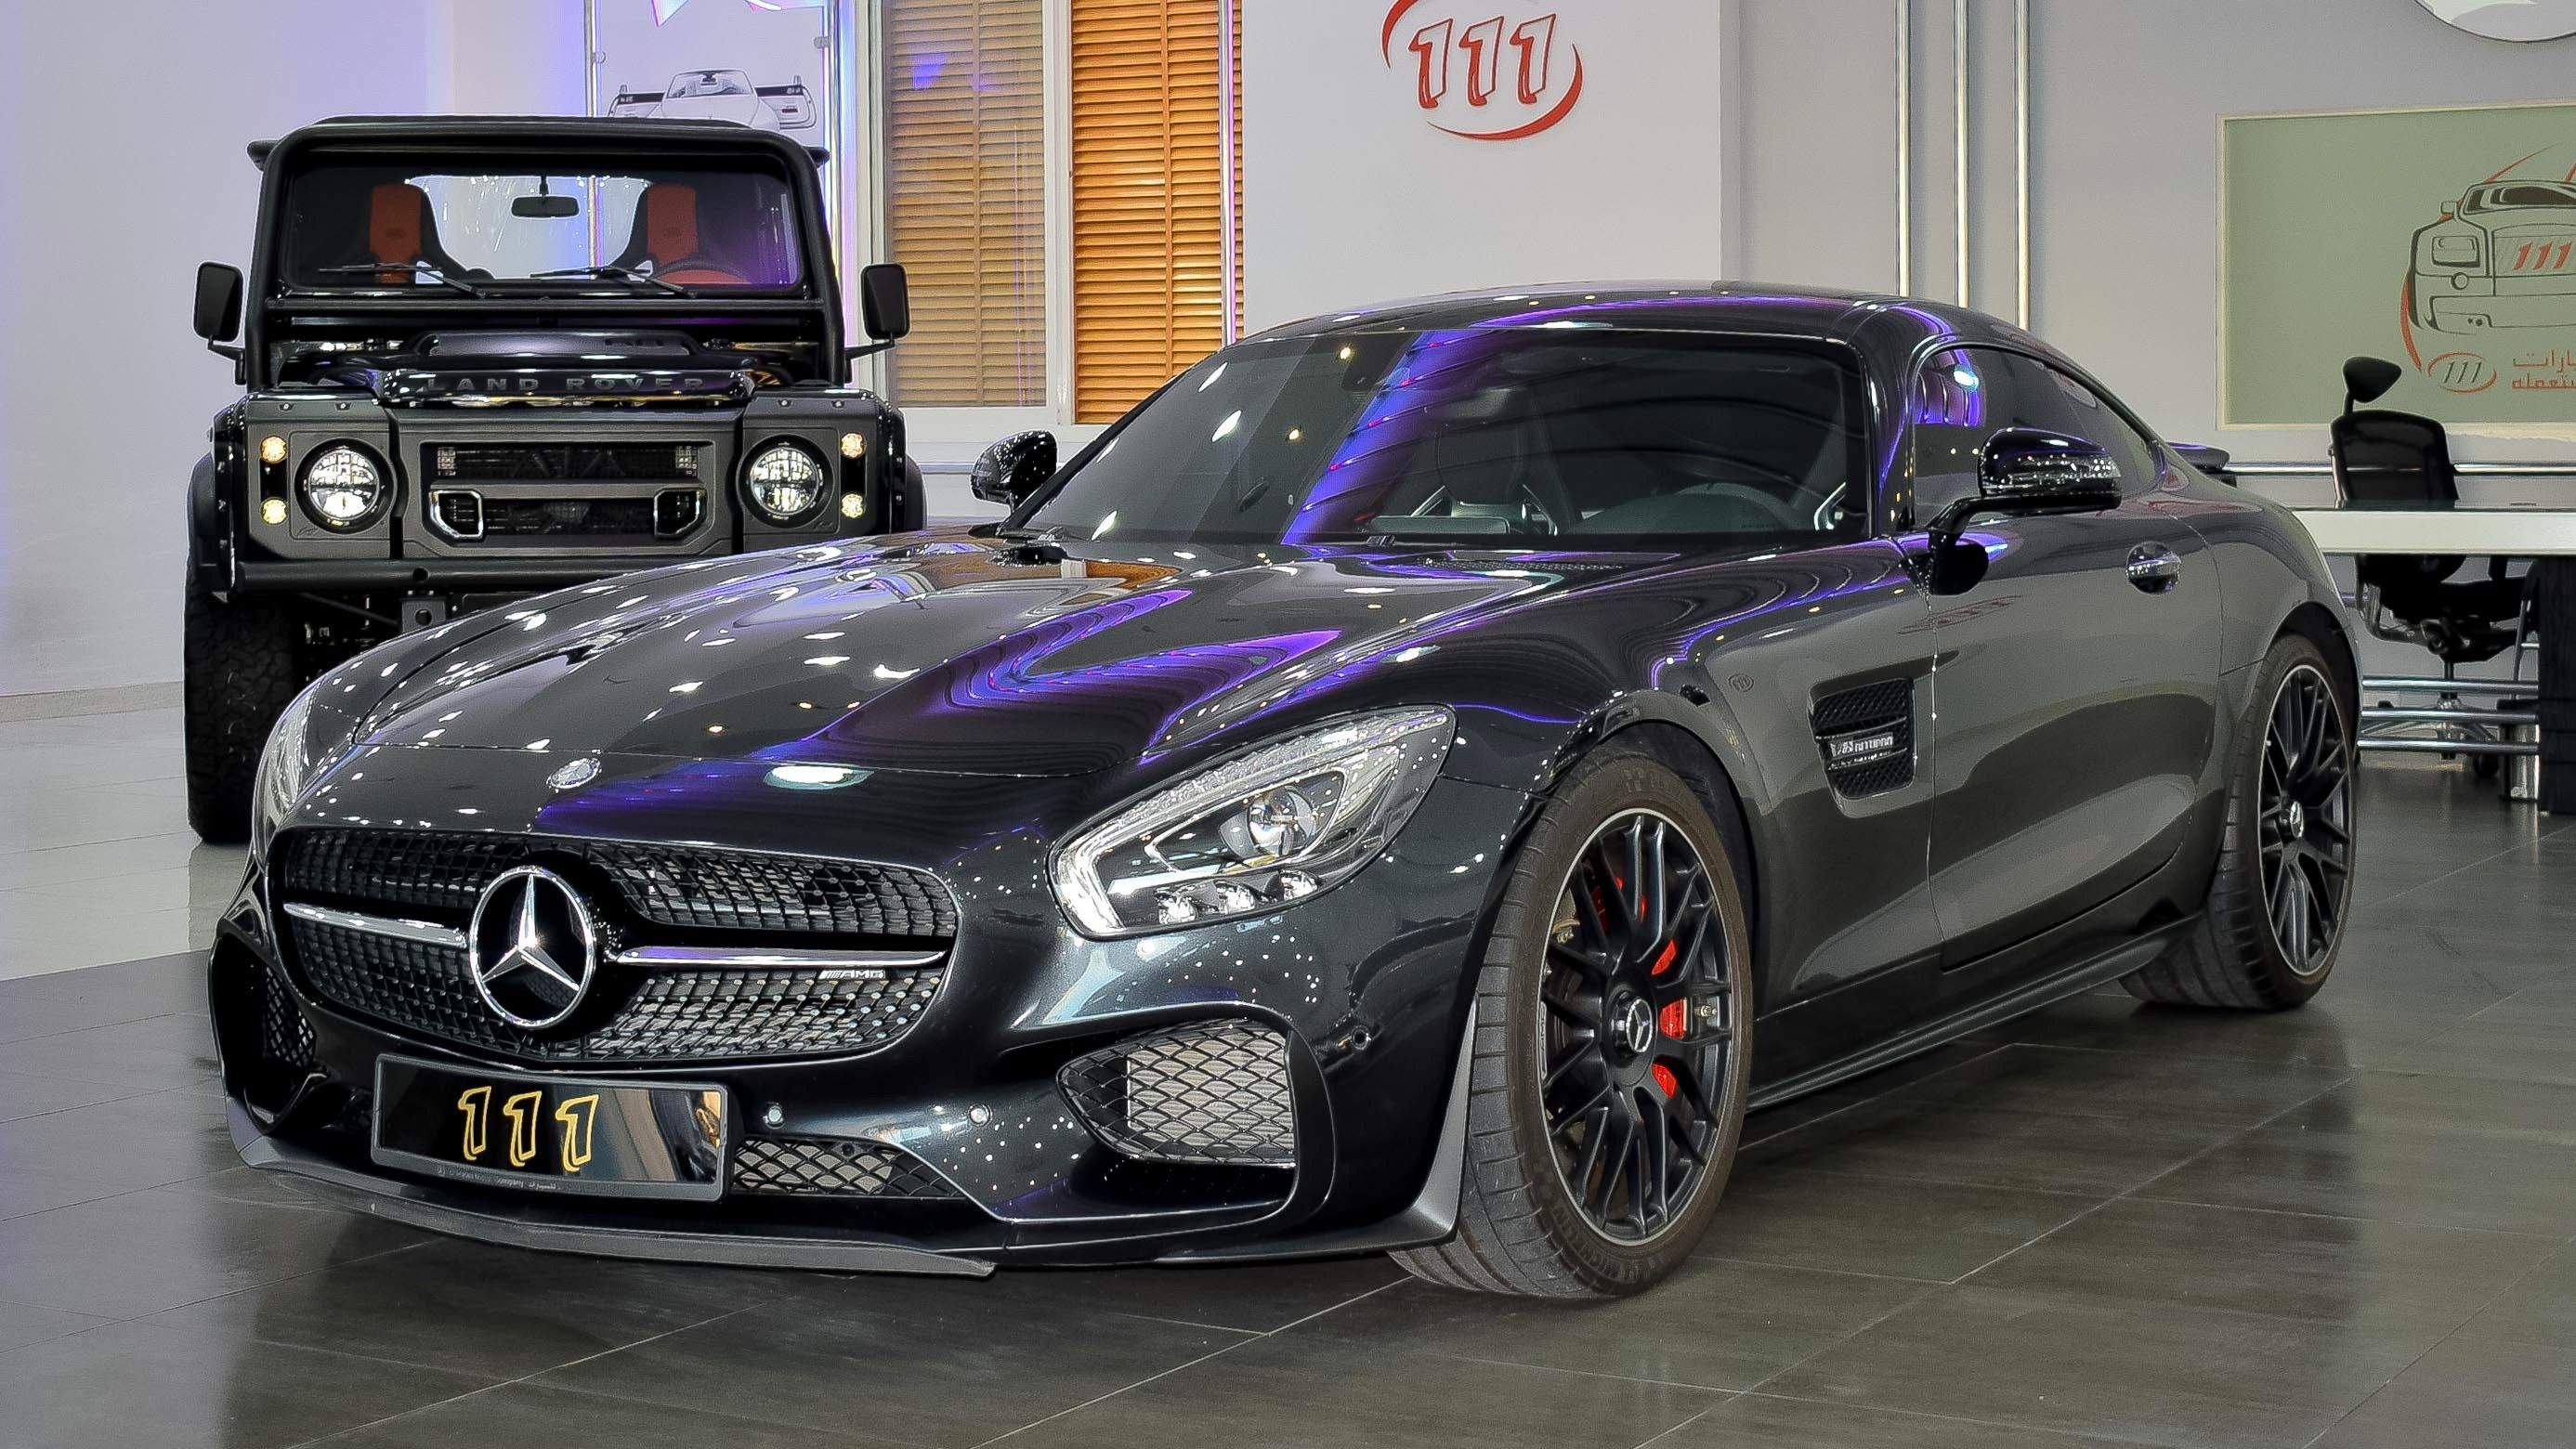 Model Mercedes Benz AMG GT S Gulf Specs Year 2016 Km 21 000 Price د إ UAE AED 410 000